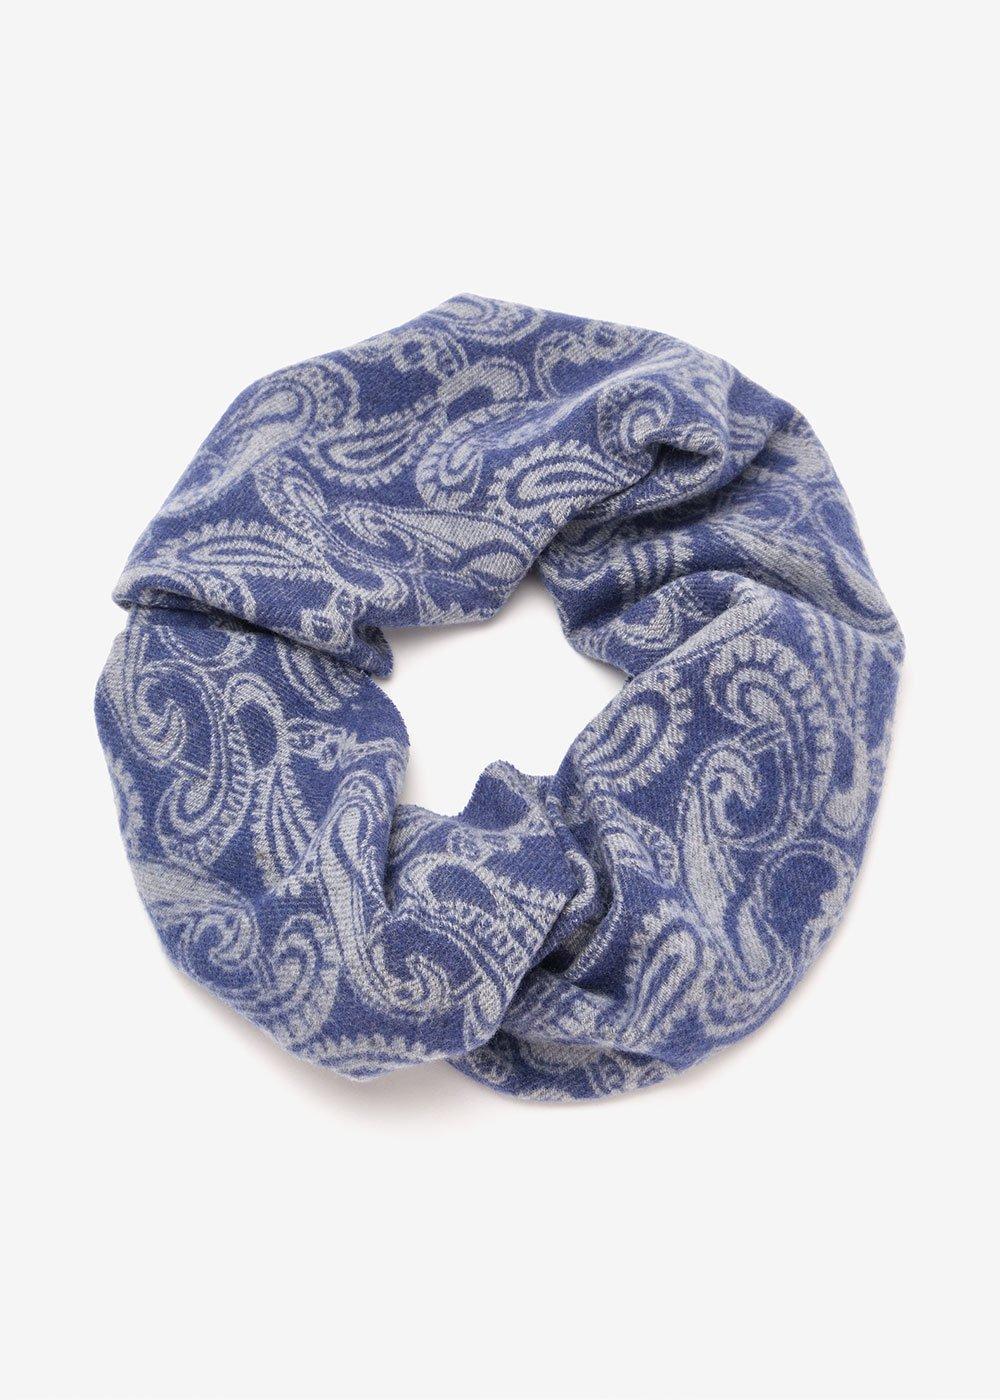 Shirly patterned scarf - Avion Elefante Fantasia - Woman